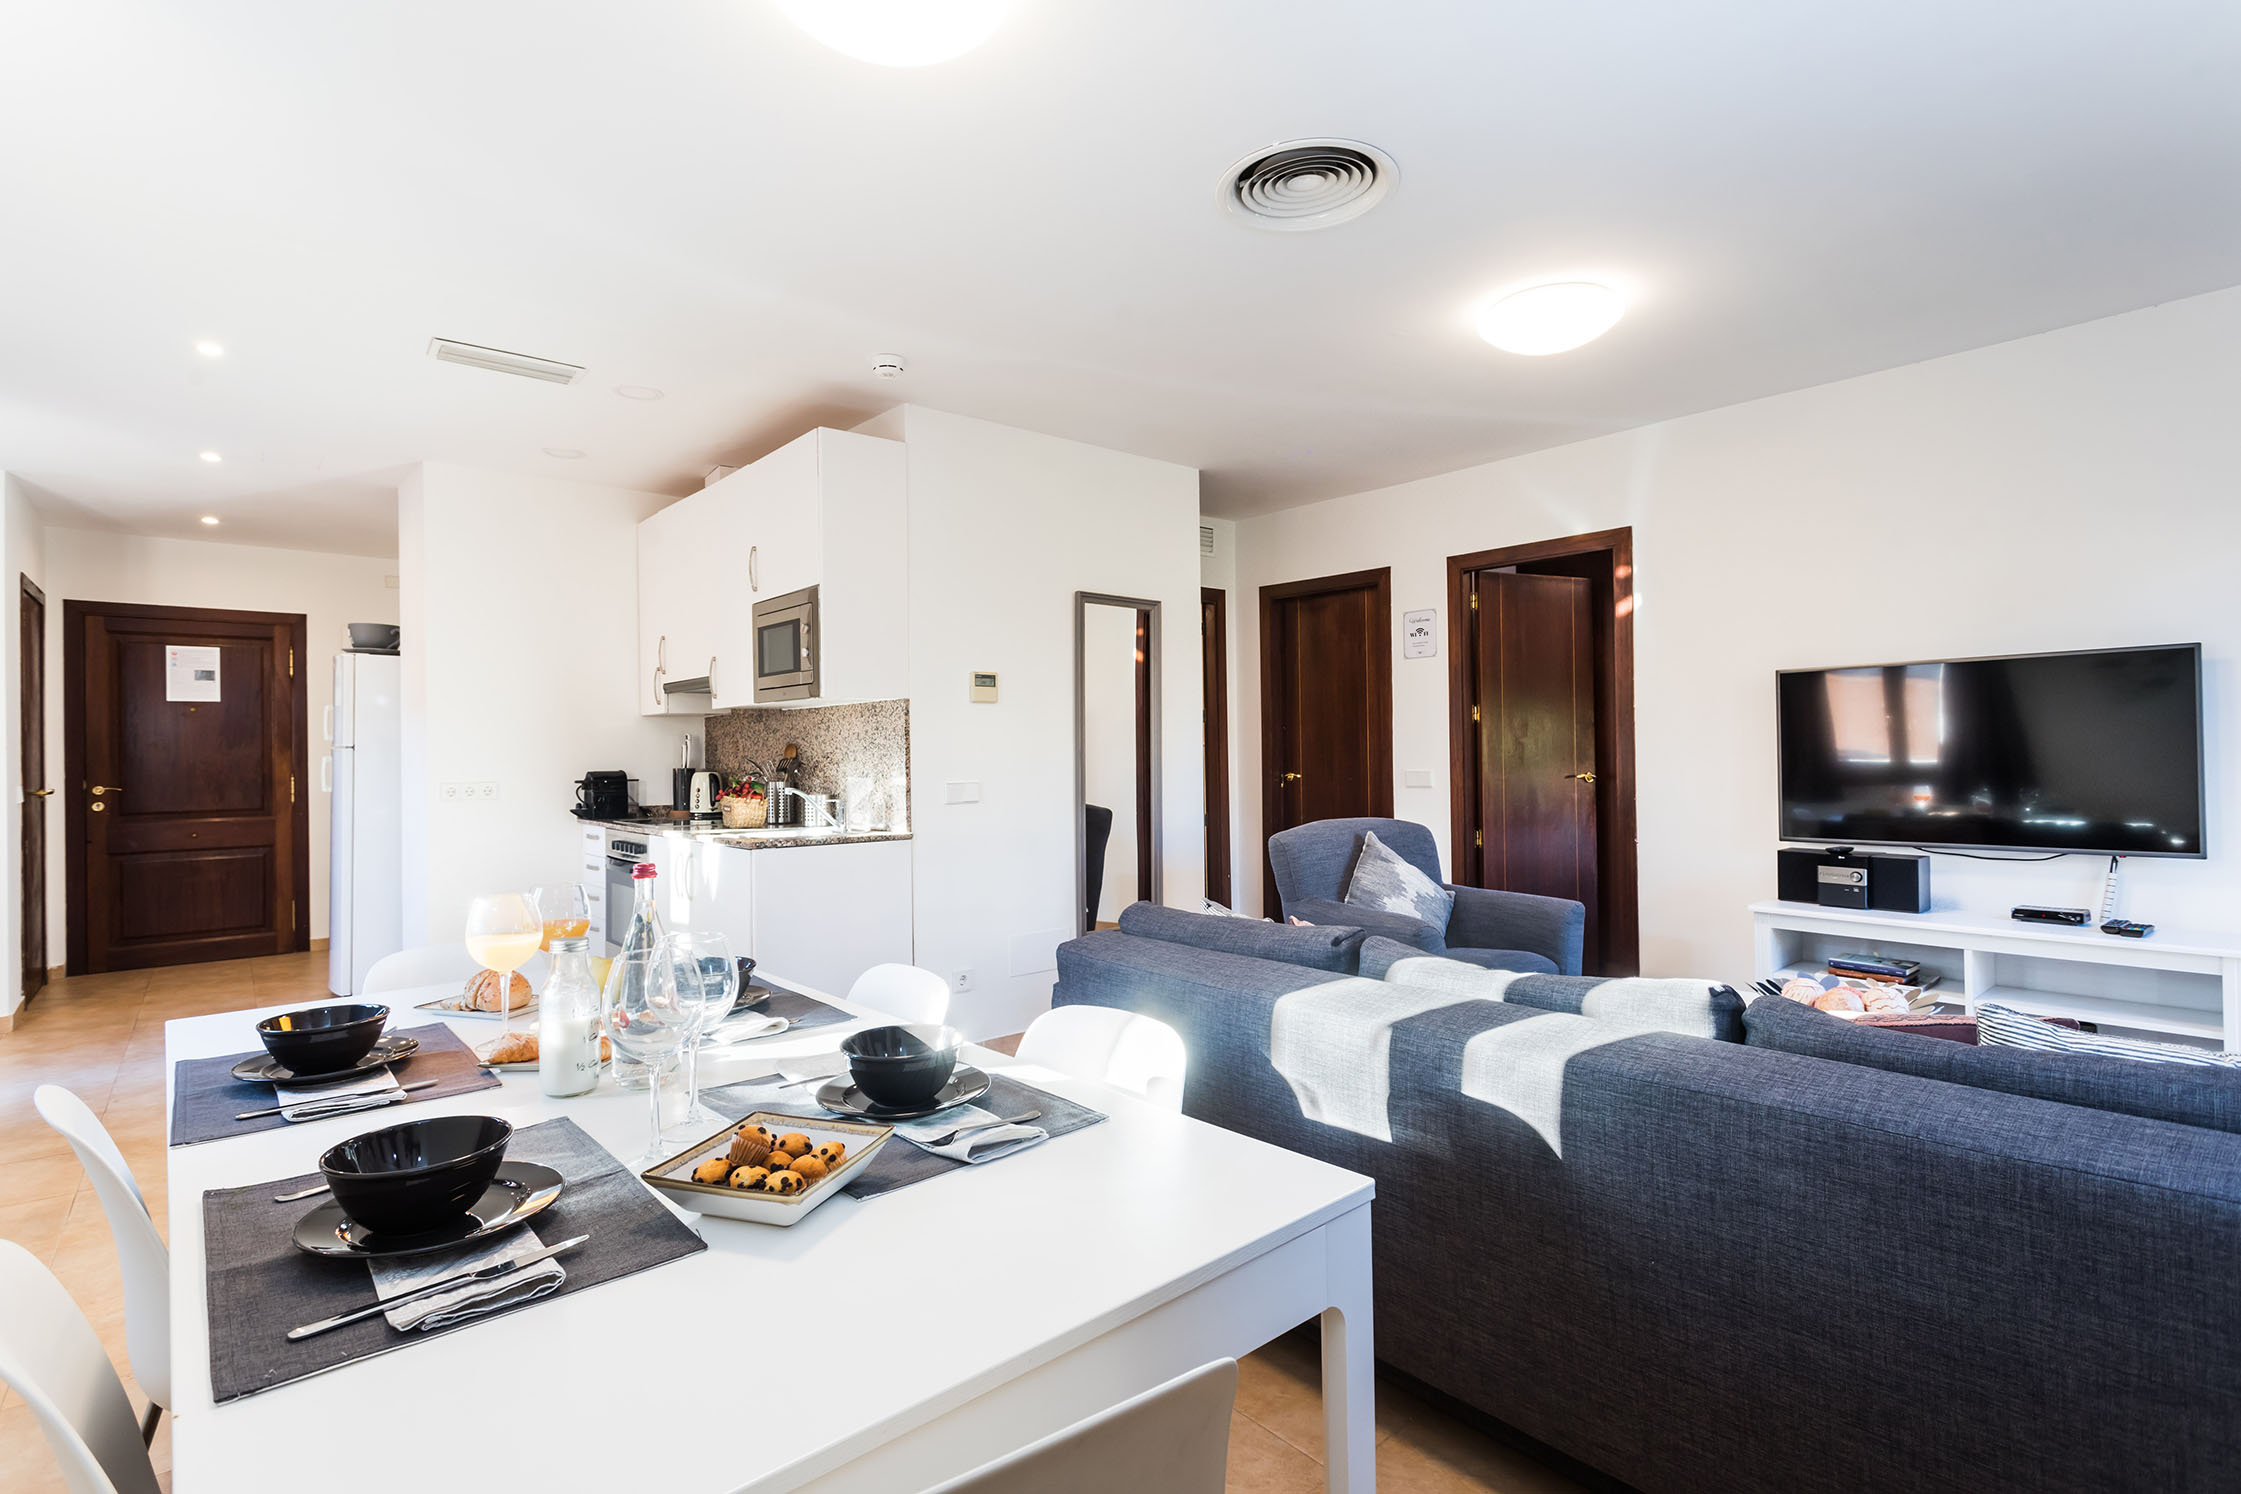 Borne-Suites-Apartamento-Atico-Terraza-Palma-de-Mallorca-Comedor